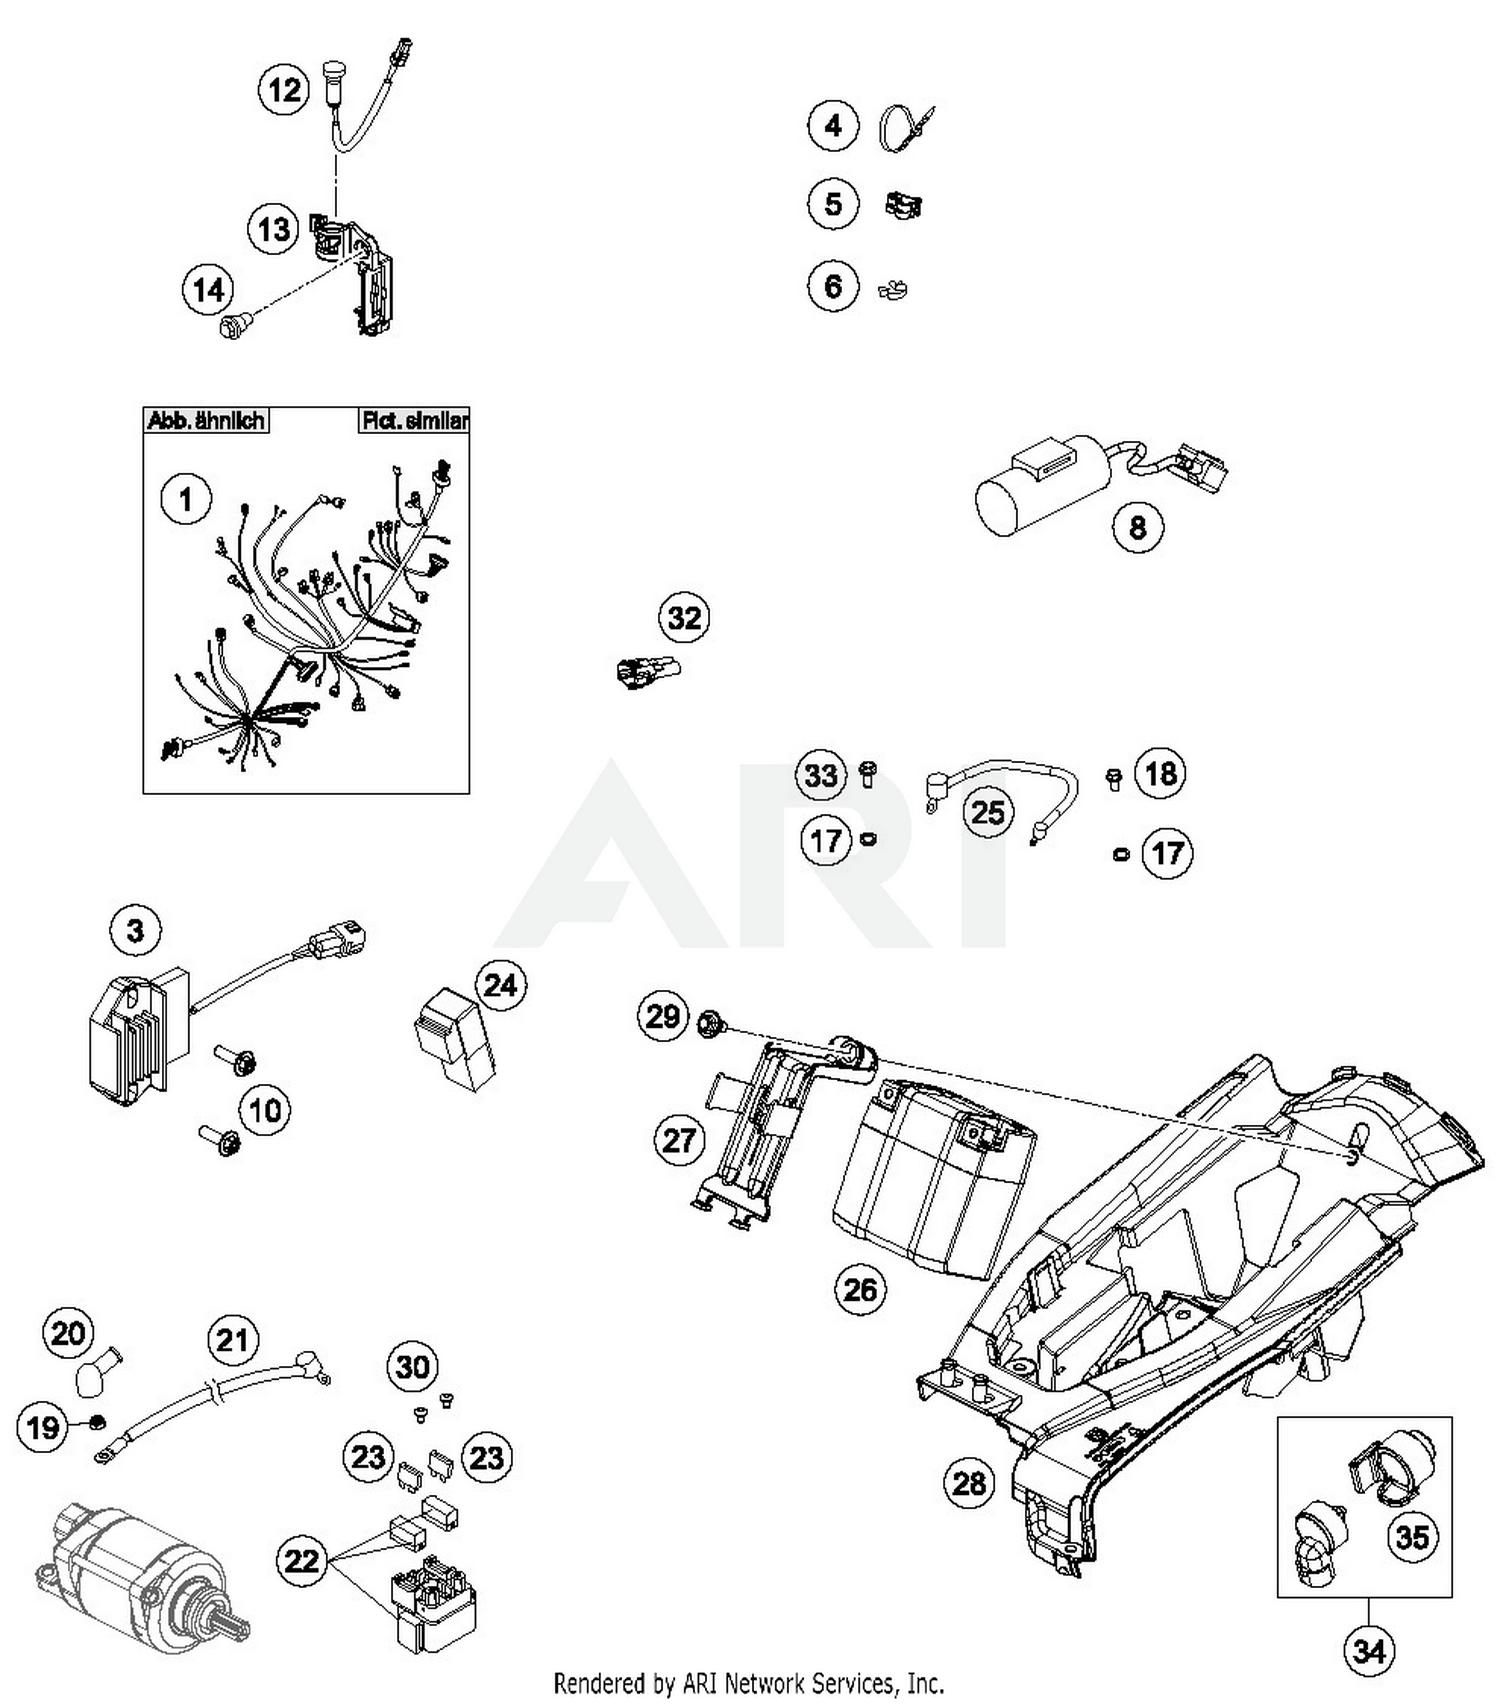 hight resolution of scamatics wiring harness engine hum wiring diagram toolbox lb7 engine wiring harness diagram engine harness wiring diagram